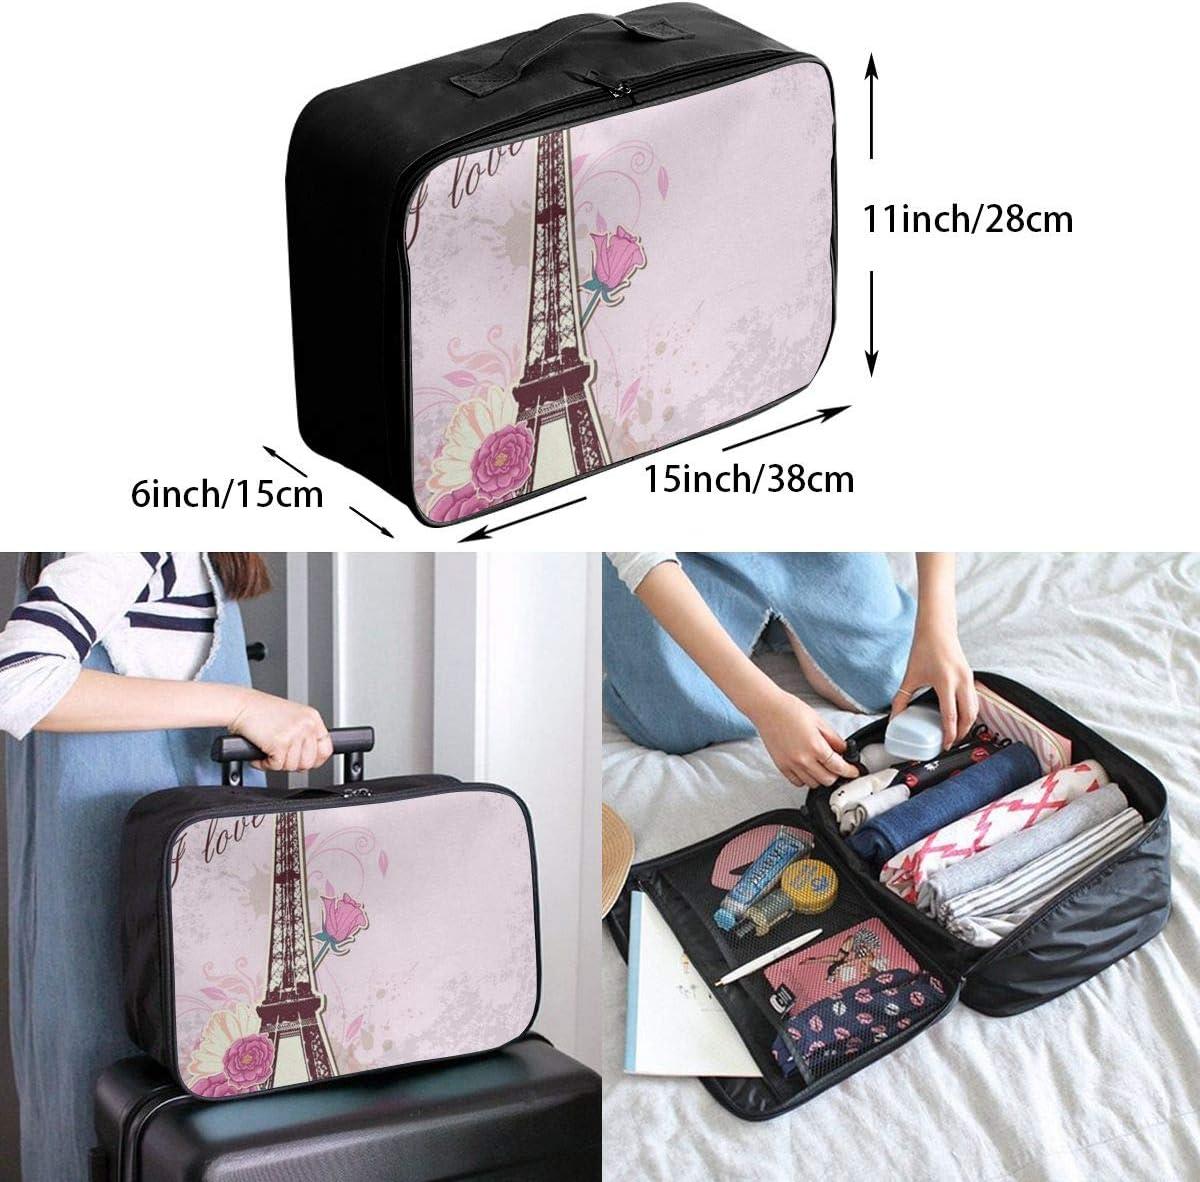 Travel Bags Love Paris Portable Tote Unique Trolley Handle Luggage Bag